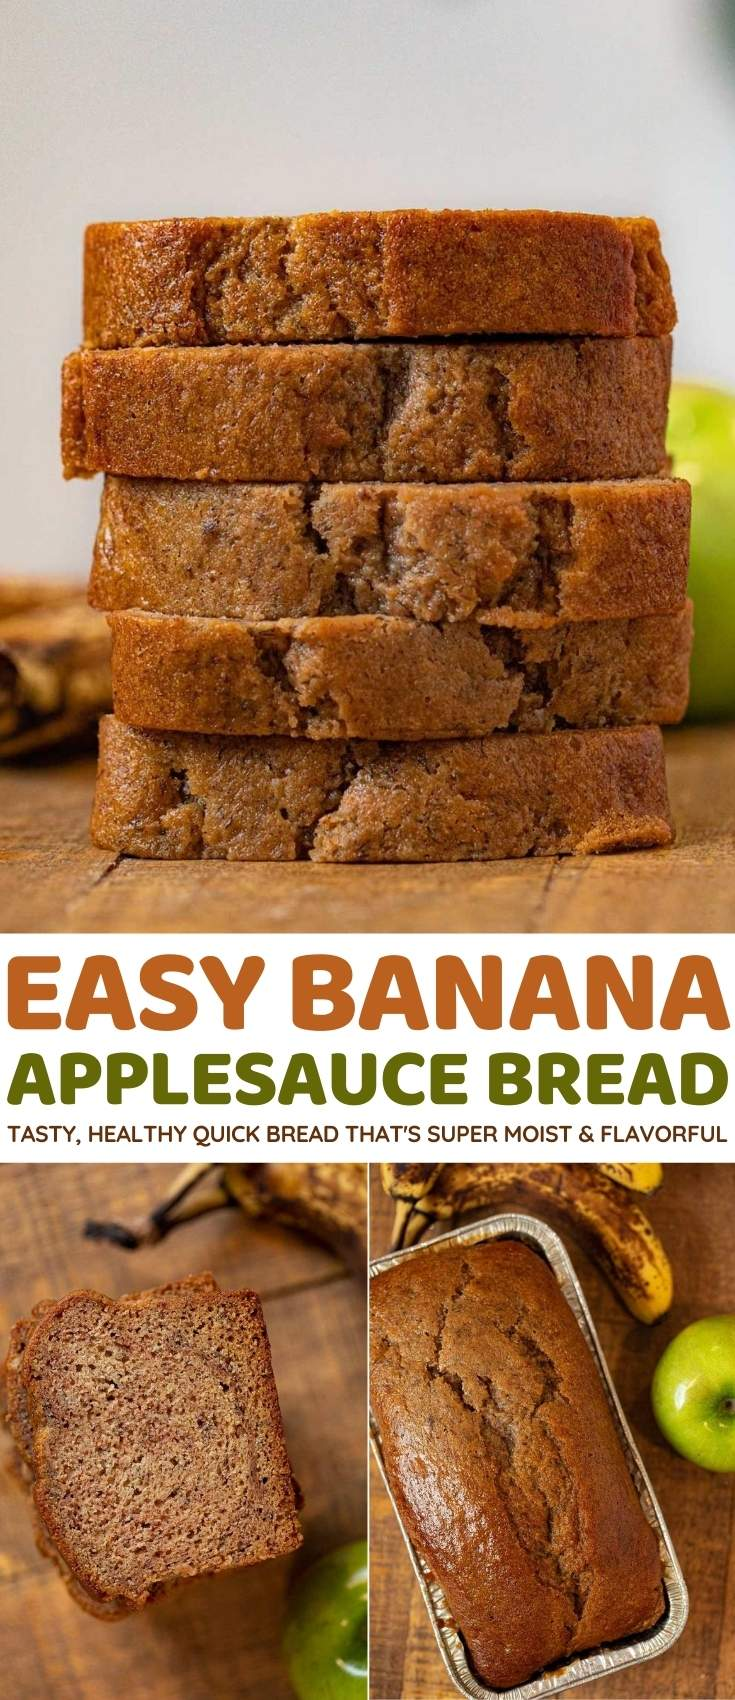 Banana Applesauce Bread collage